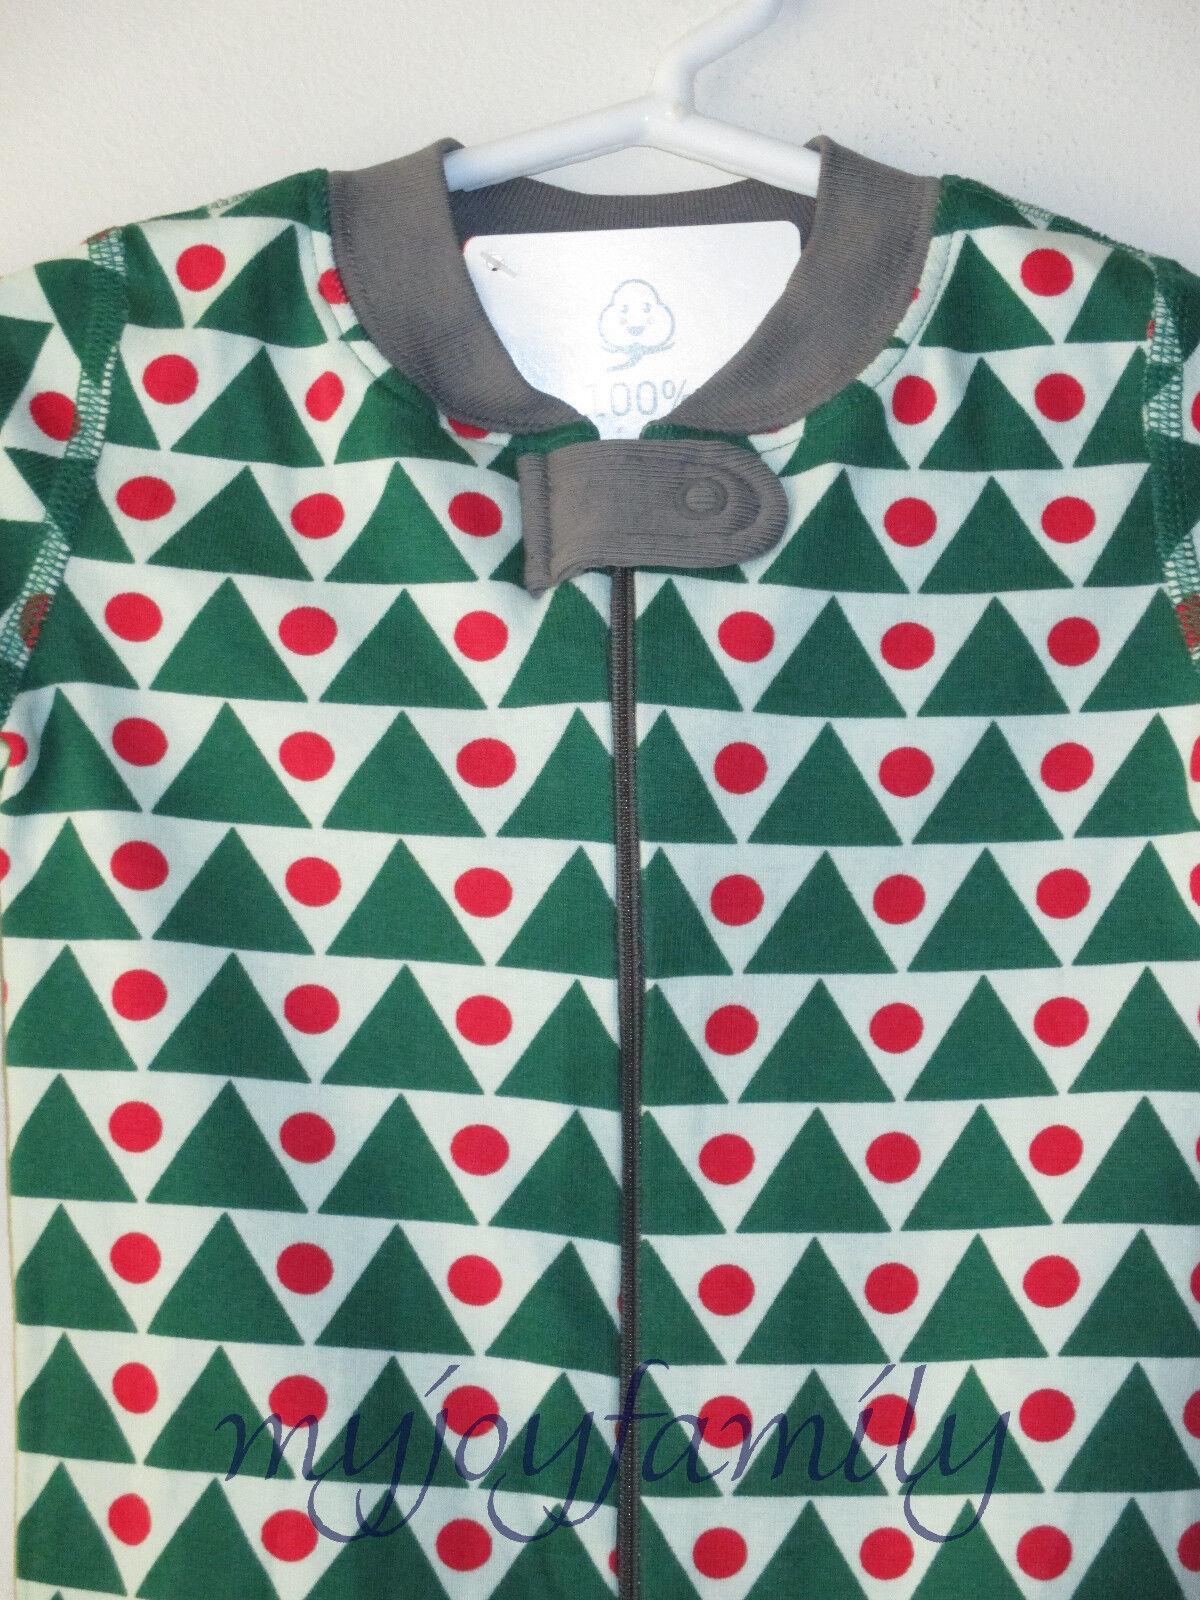 7b5624120 Buy Hanna Andersson Organic Baby ZIPPER Sleeper Geo Green Triangles ...